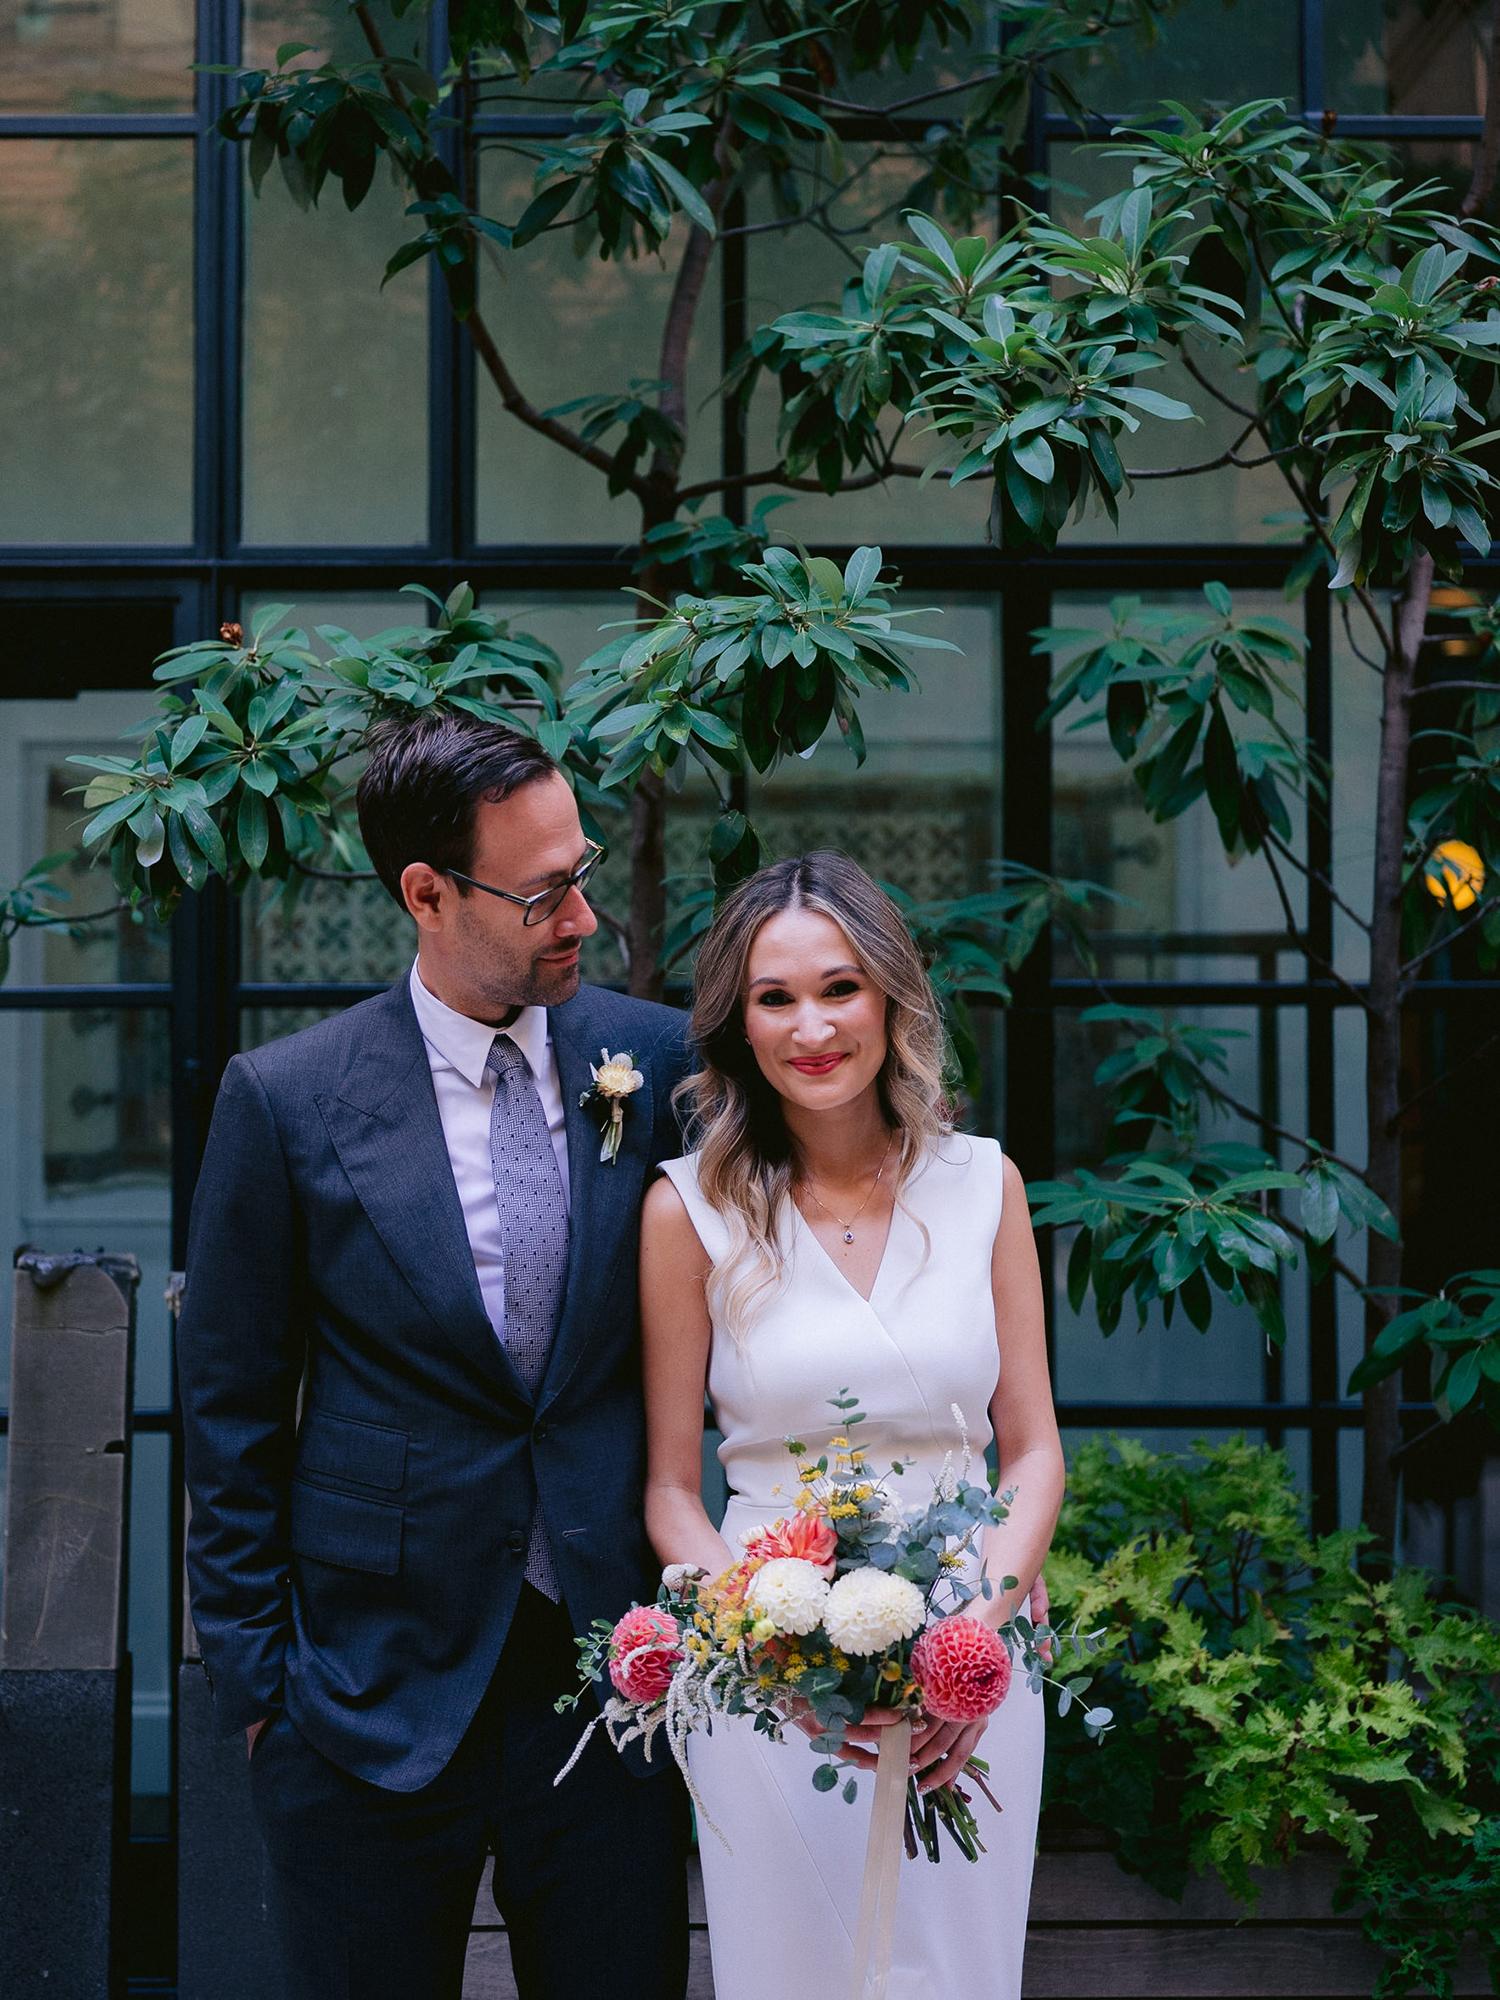 City-Hall-Elopement-New-York-Wedding-Photographer-007